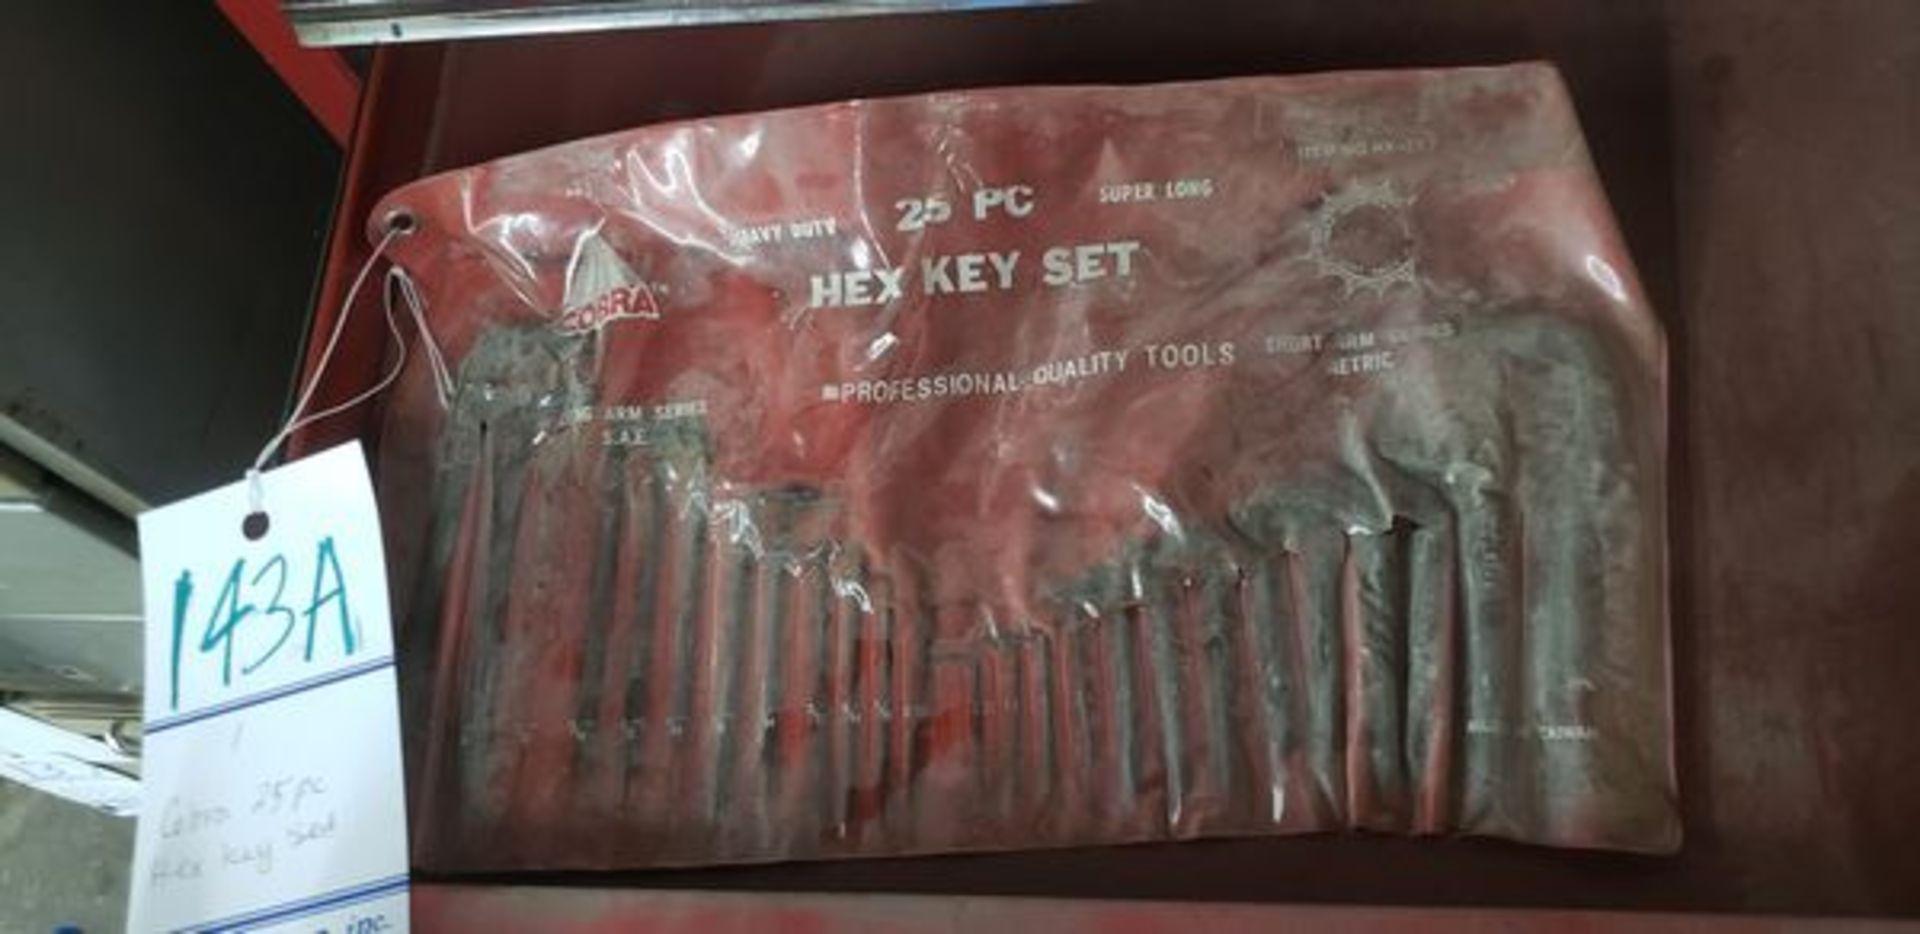 COBRA 25PC HEX KEY SET